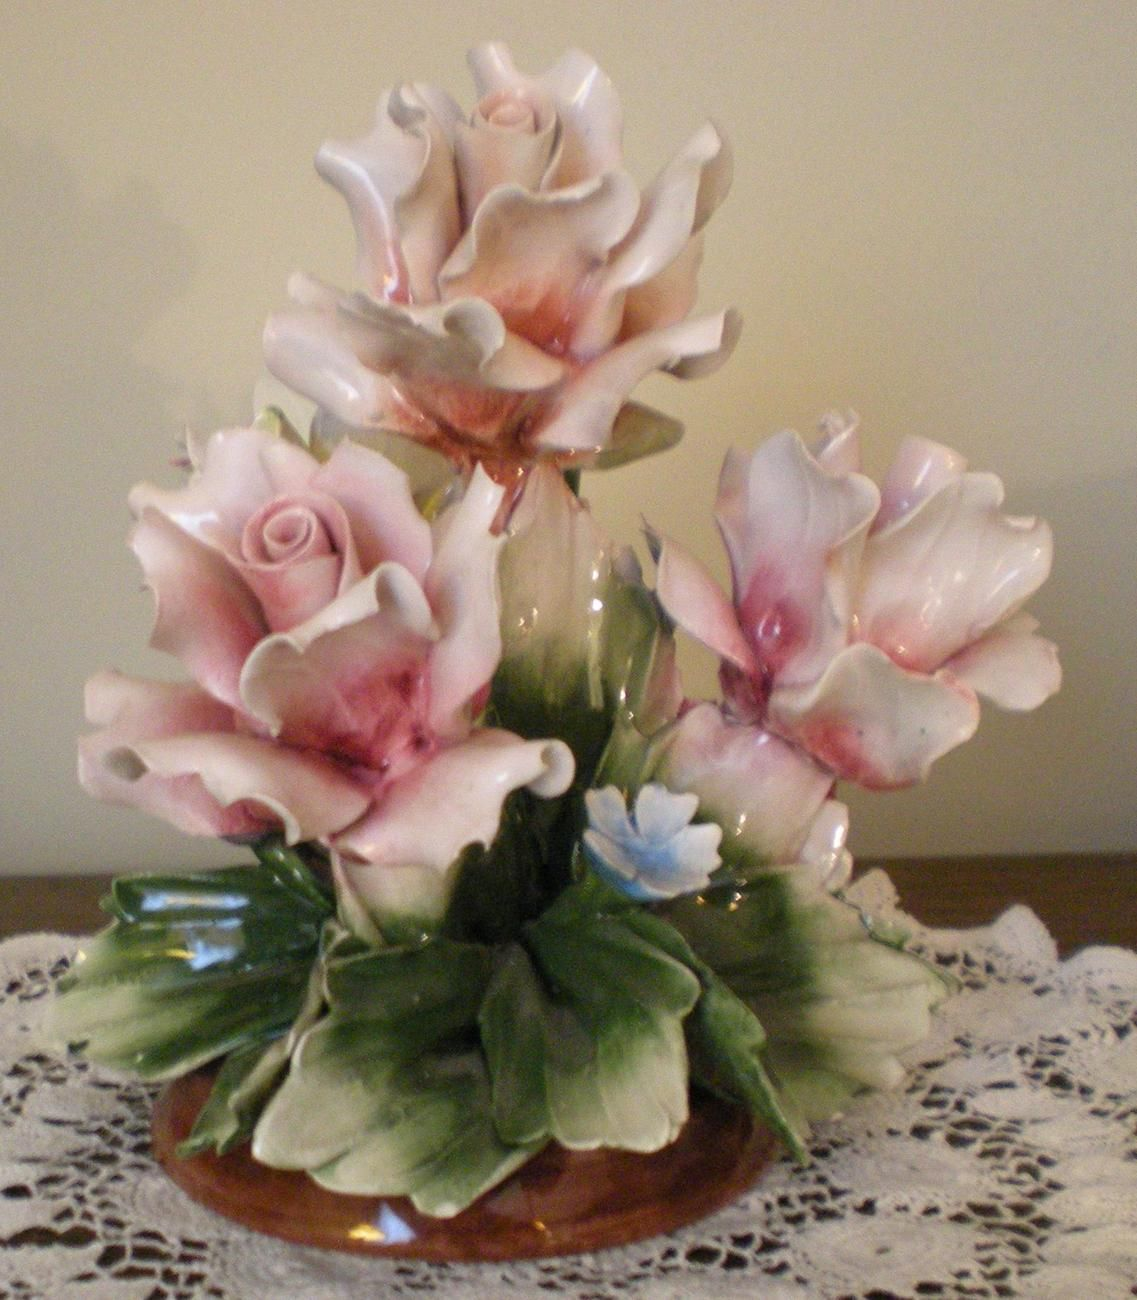 Capodimonte rose centerpiece 美工芸 pinterest